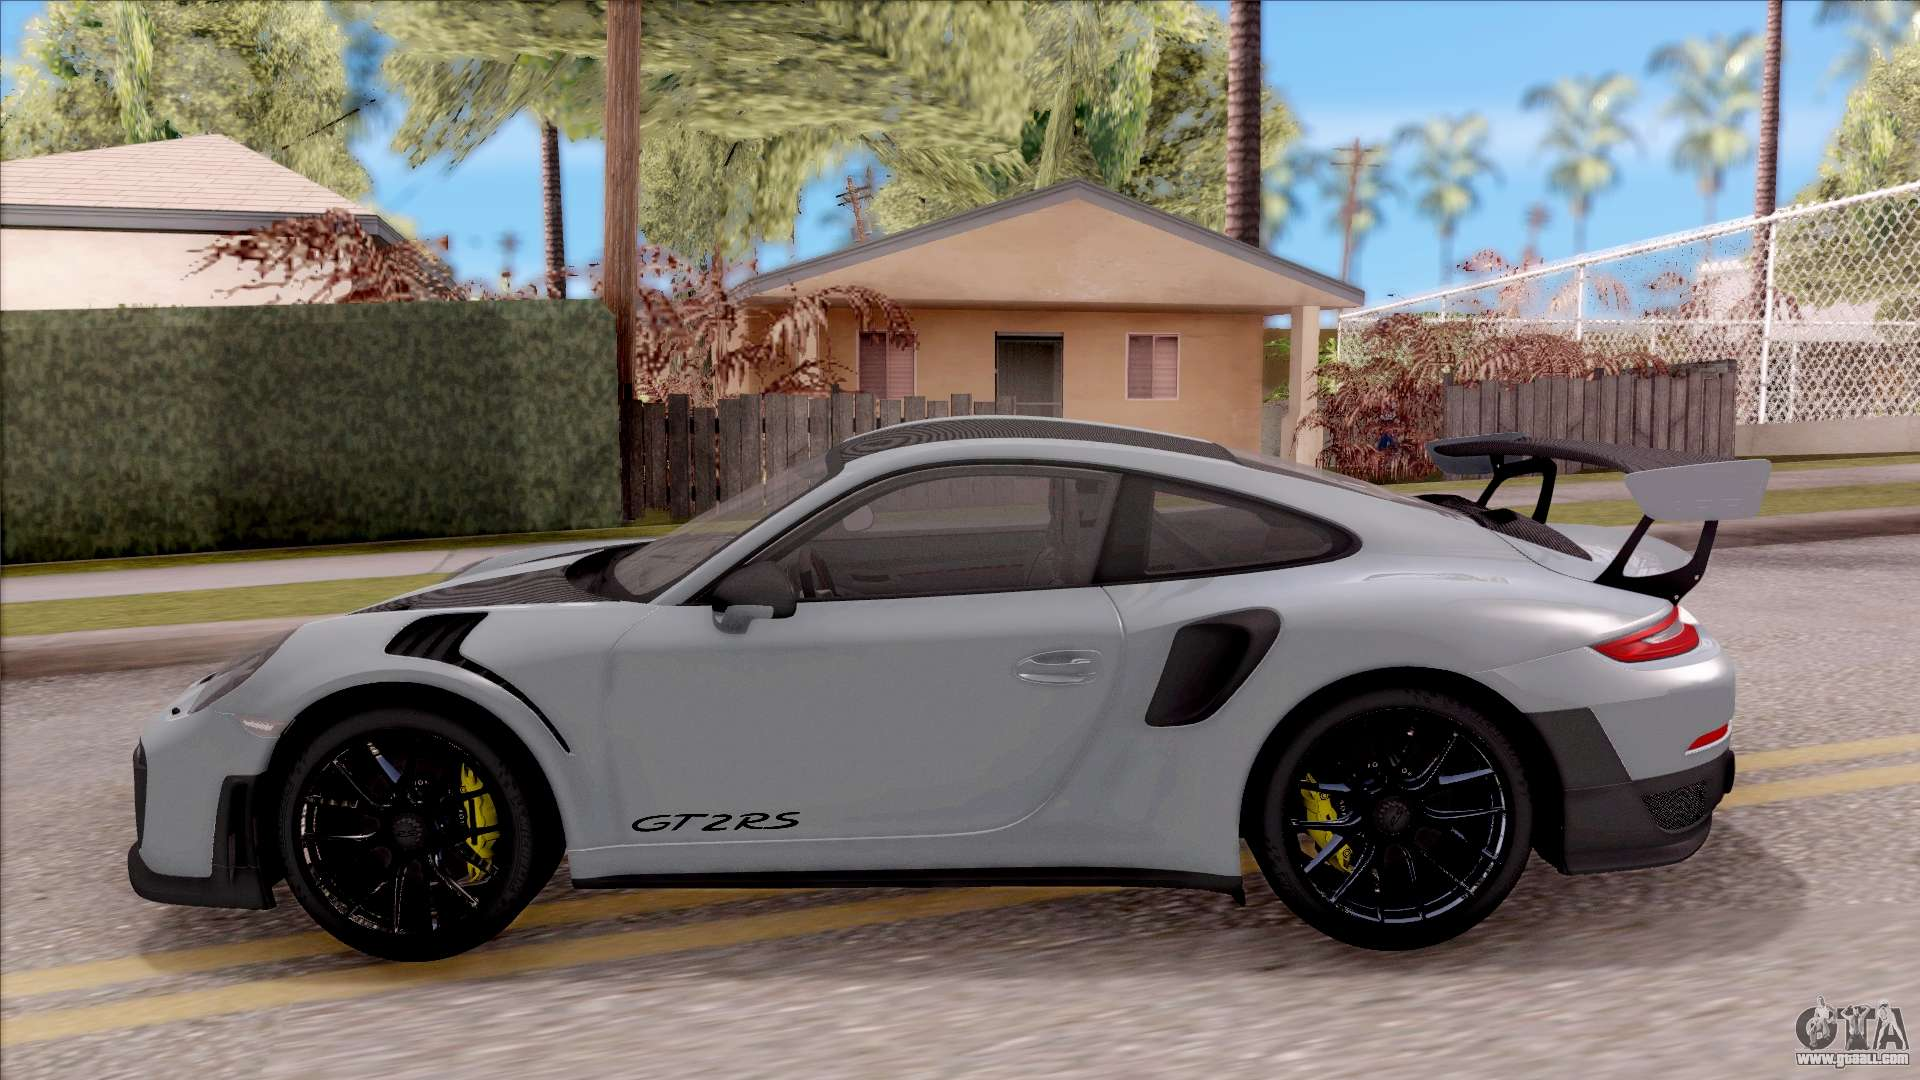 418324-enb2017-7-10-5-14-52 Stunning Porsche 911 Gt2 Rs Vs Lamborghini Aventador Cars Trend